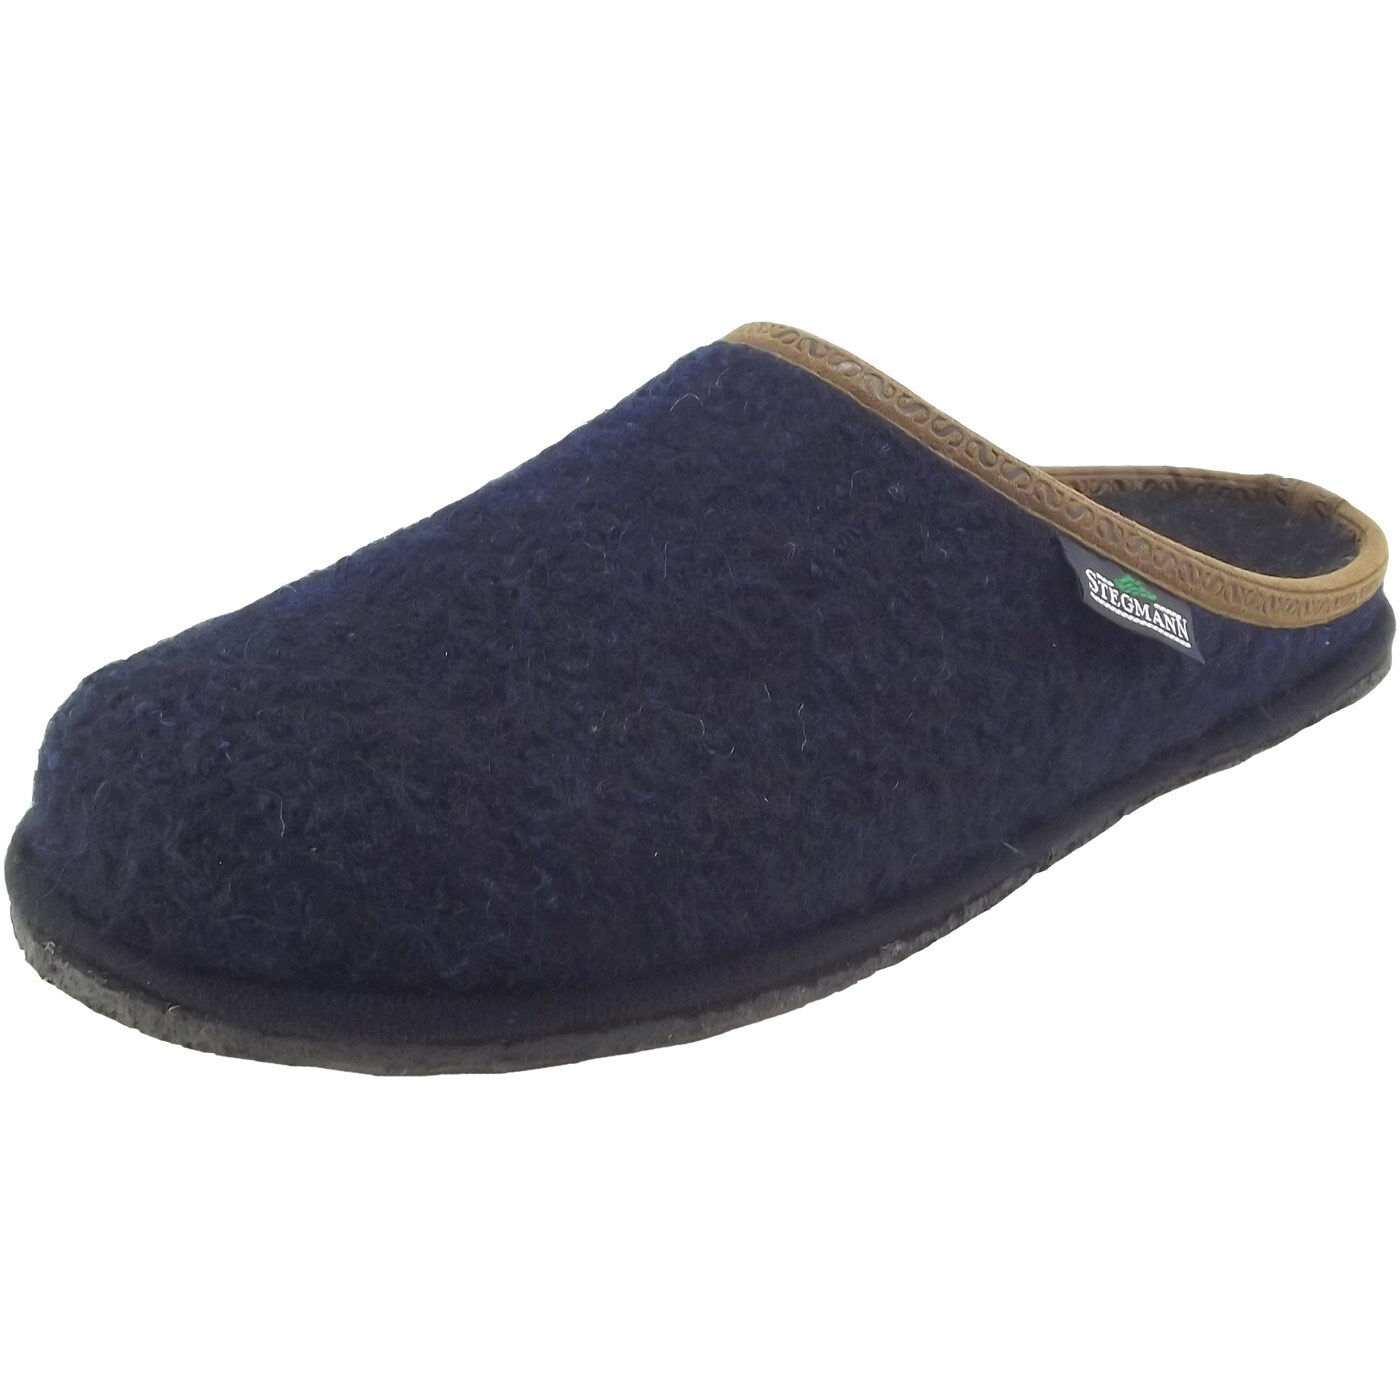 Stegmann 301 Unisex Walkfilz-Pantoffeln dunkelblau (dark Blau)